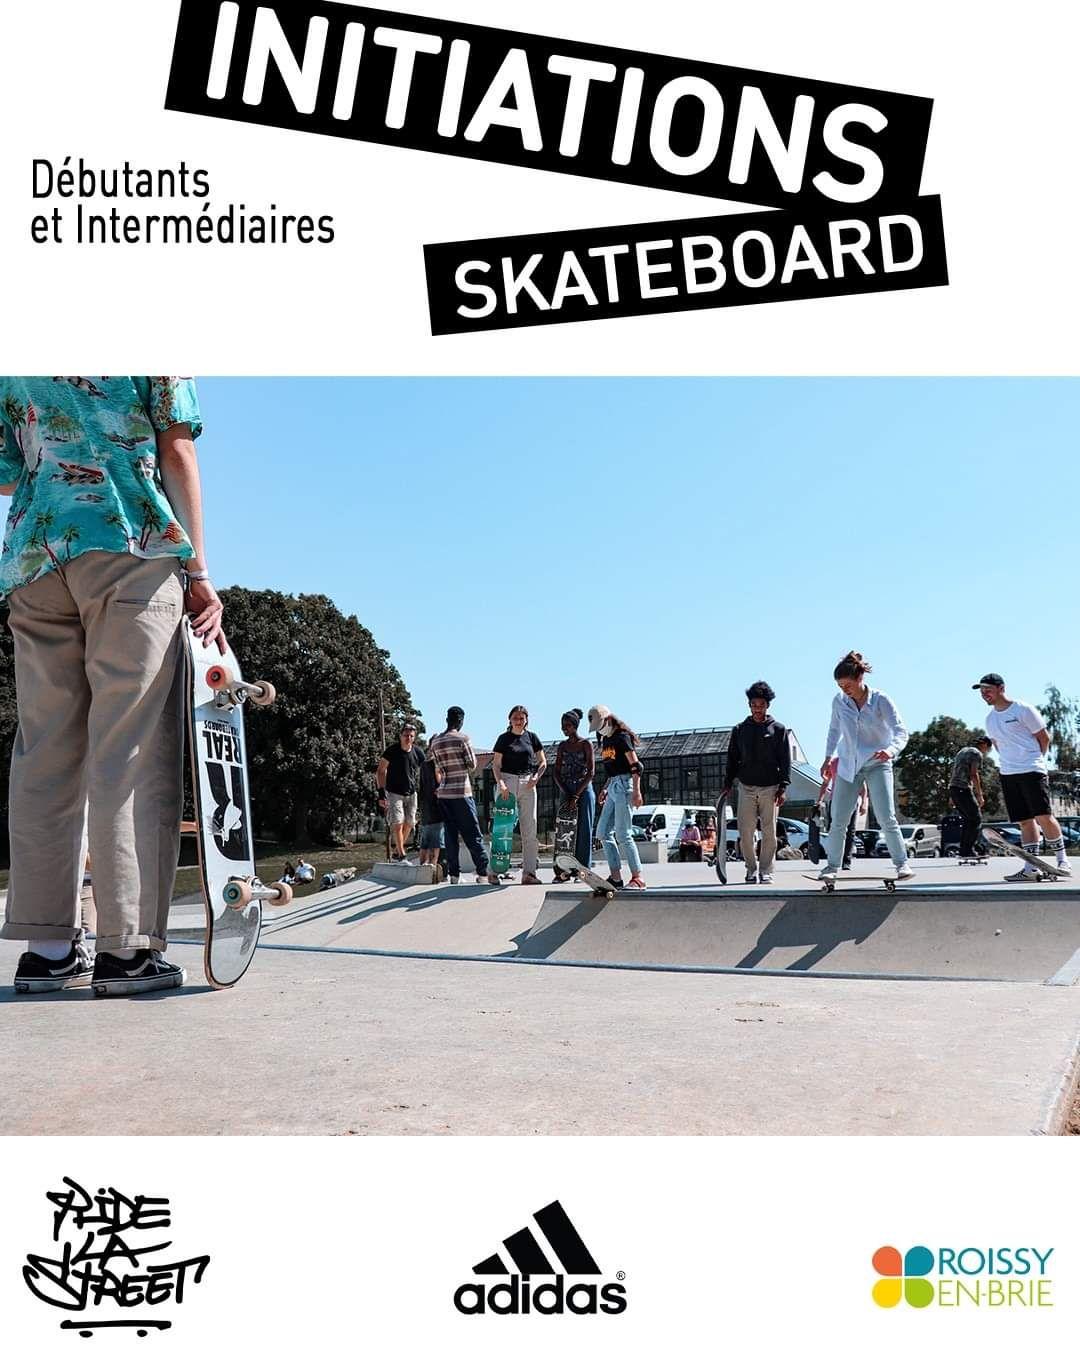 Initiation de Skateboard 1h gratuite - Roissy en Brie (77)